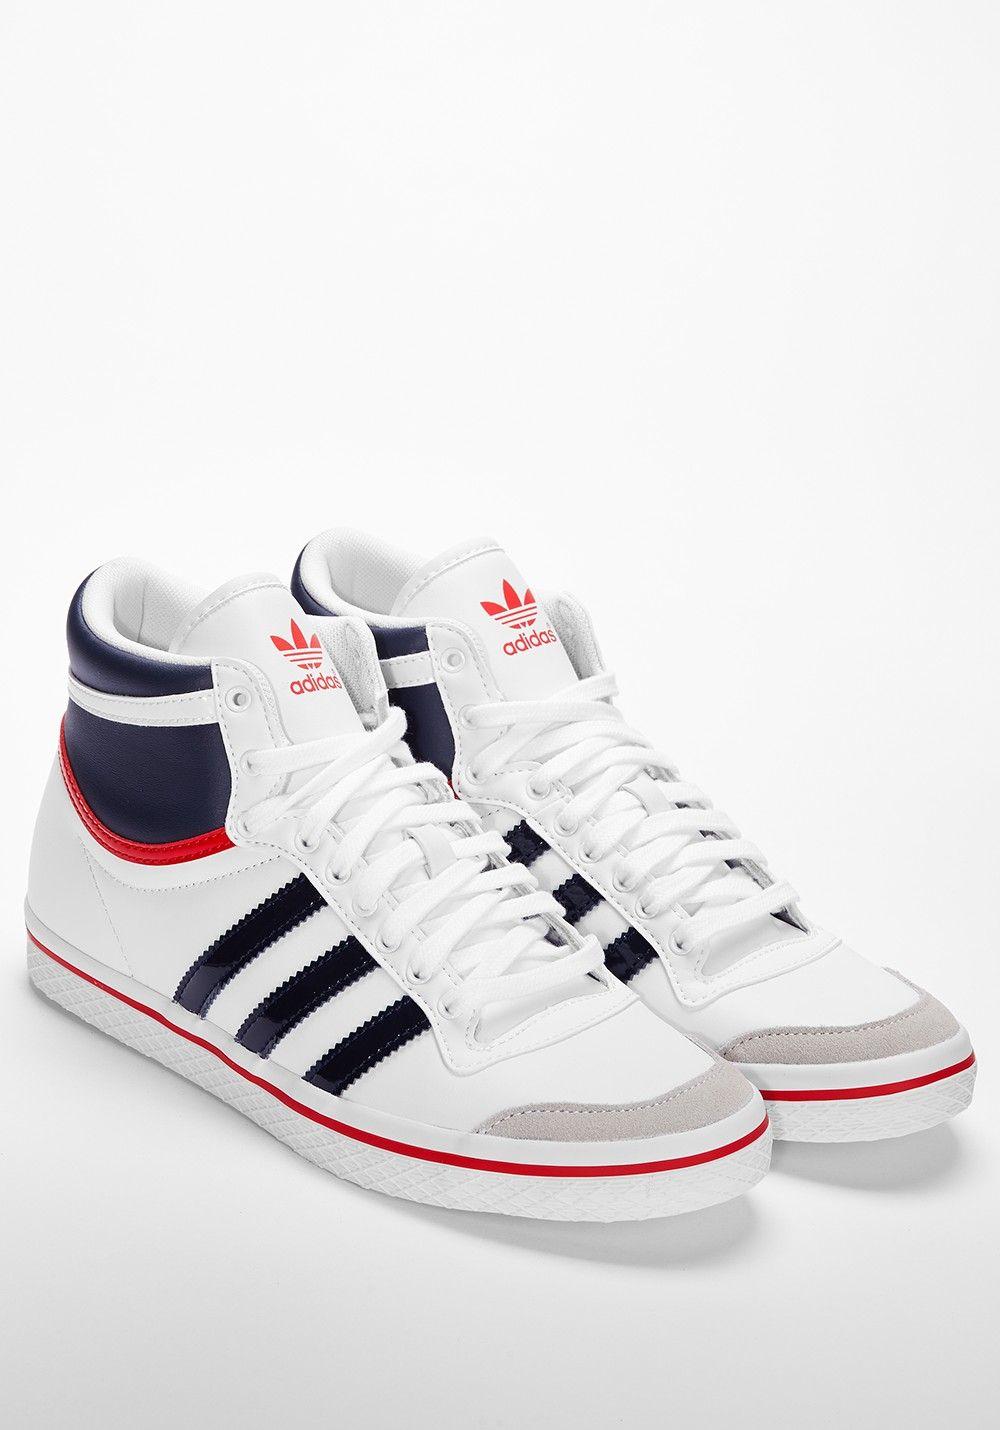 Adidas Top Ten Vulc Lth Syn Tx Sneaker Adidas Sneaker Freizeitschuhe